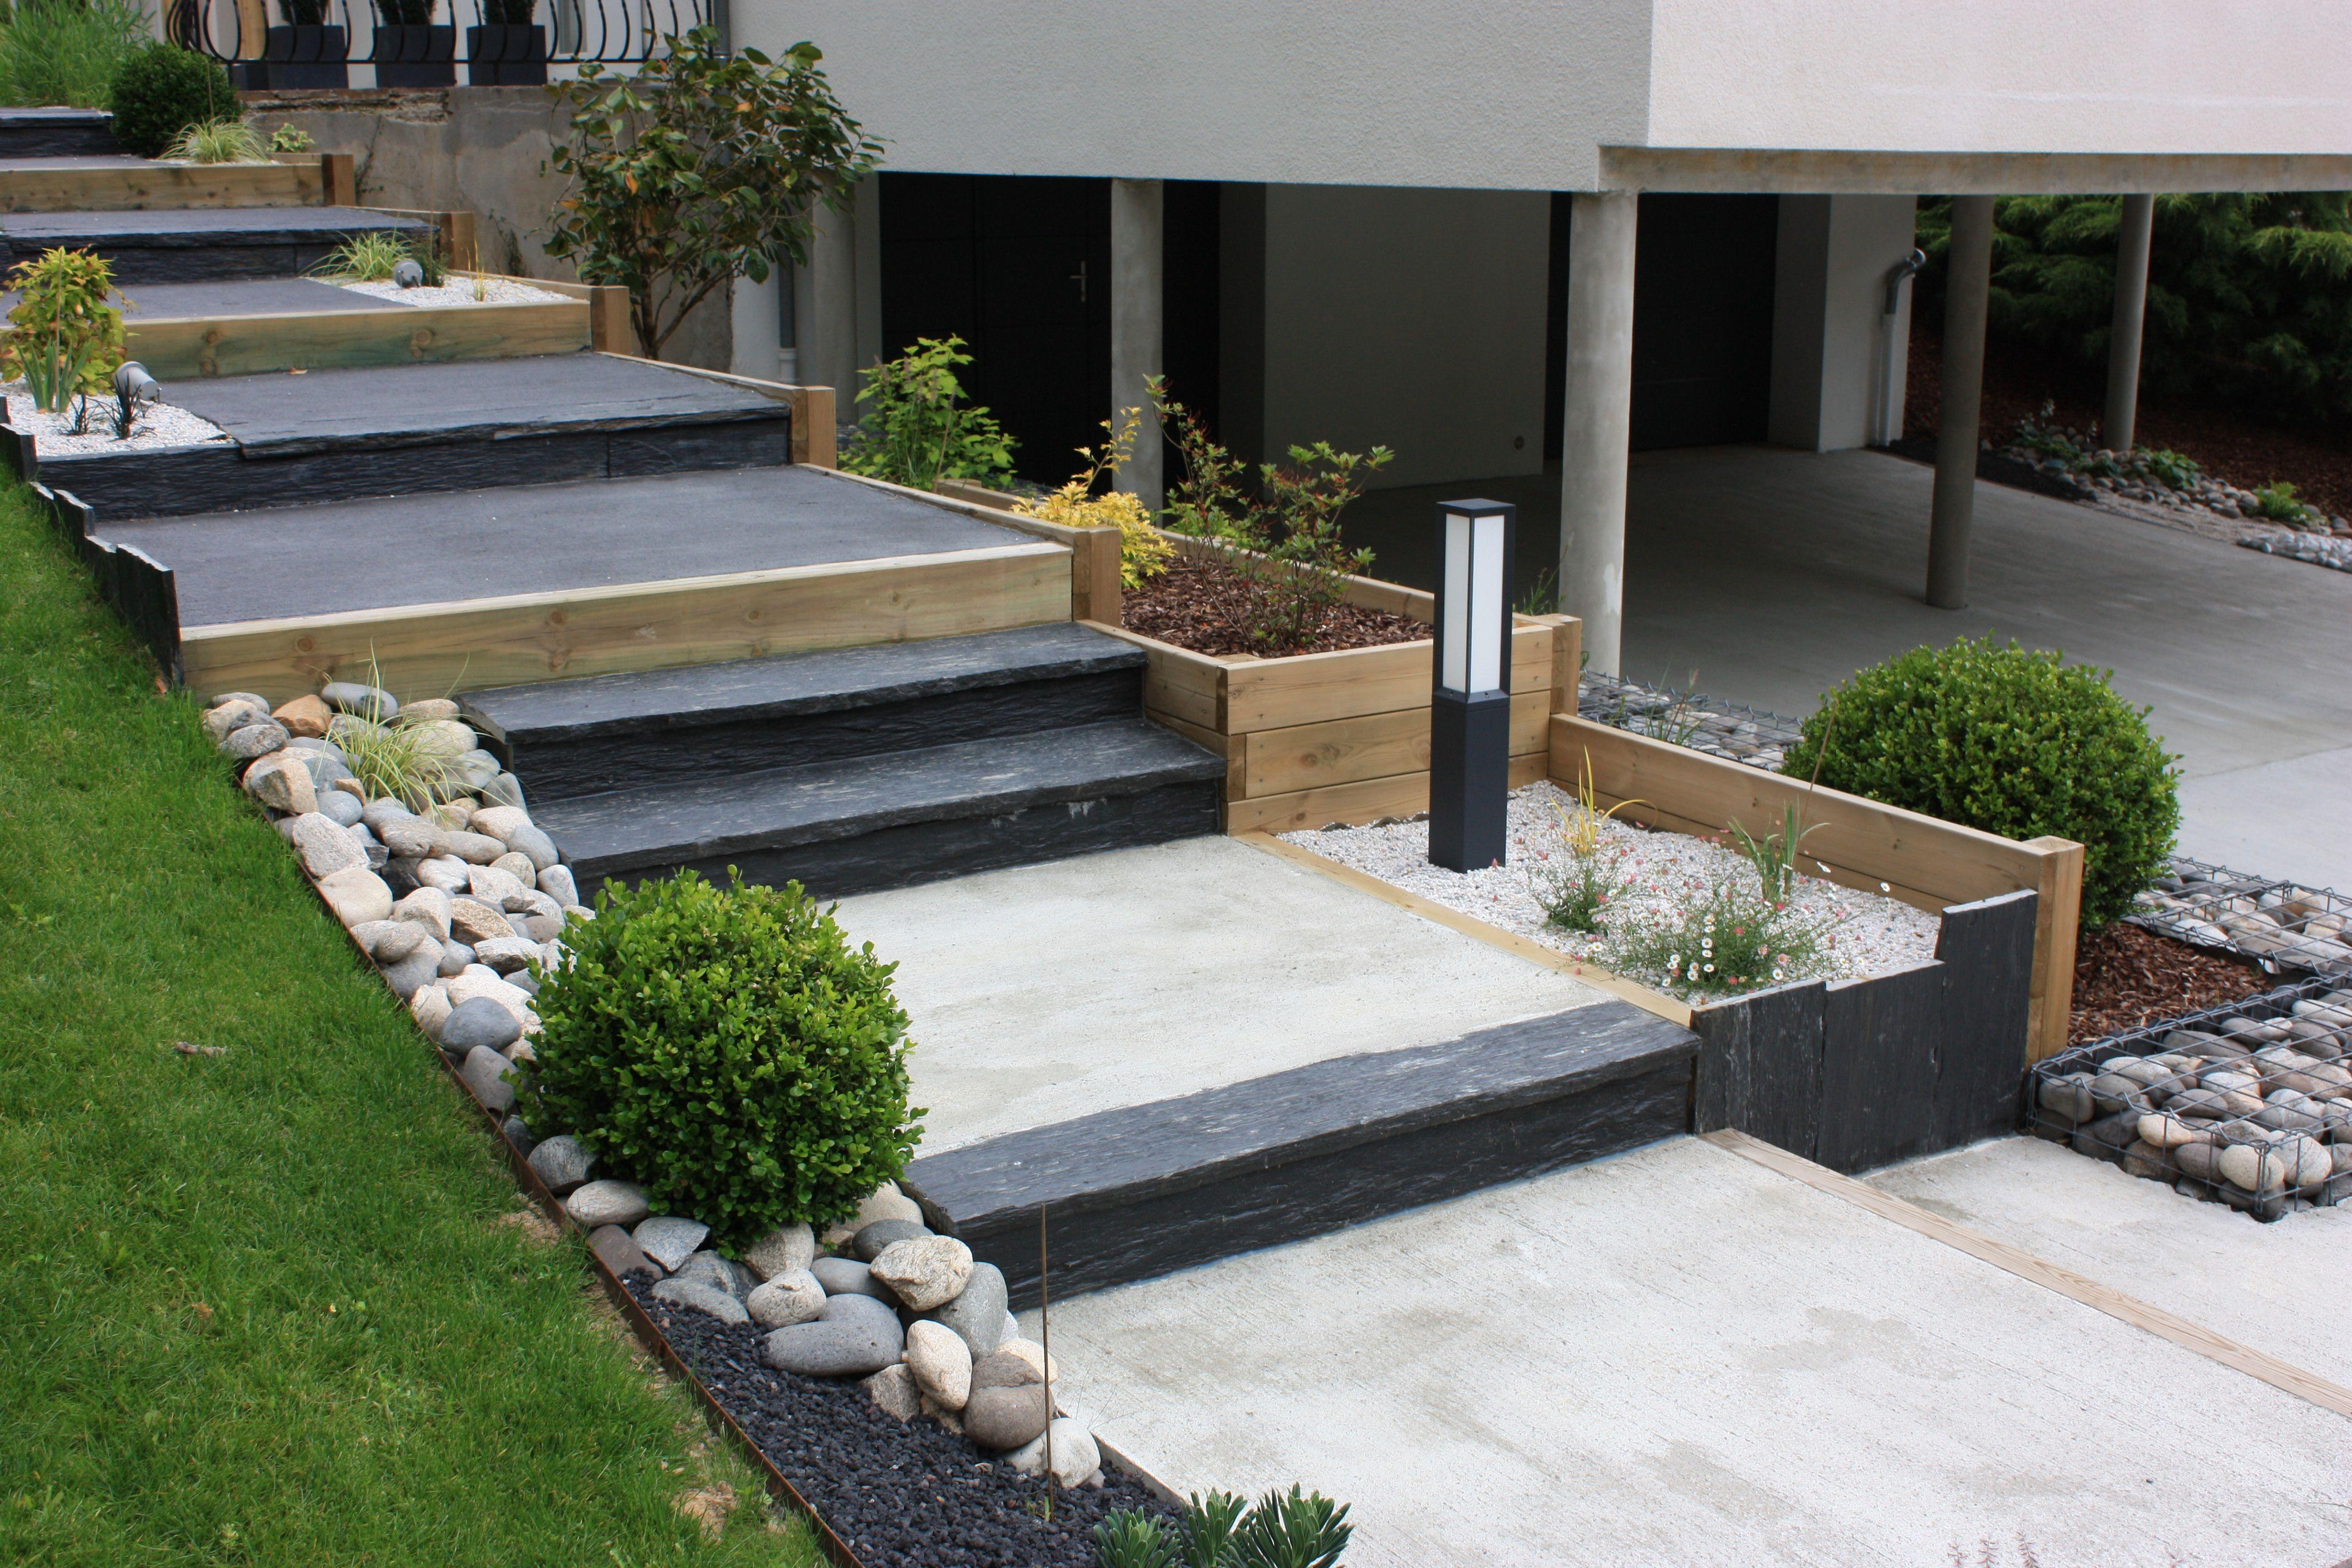 Rebeyrolcreateurdejardins Amenagementjardin Amenagementescalier Escalier Escaliermoderne Escaliercon Amenagement Jardin Escalier De Jardin Marches Jardin